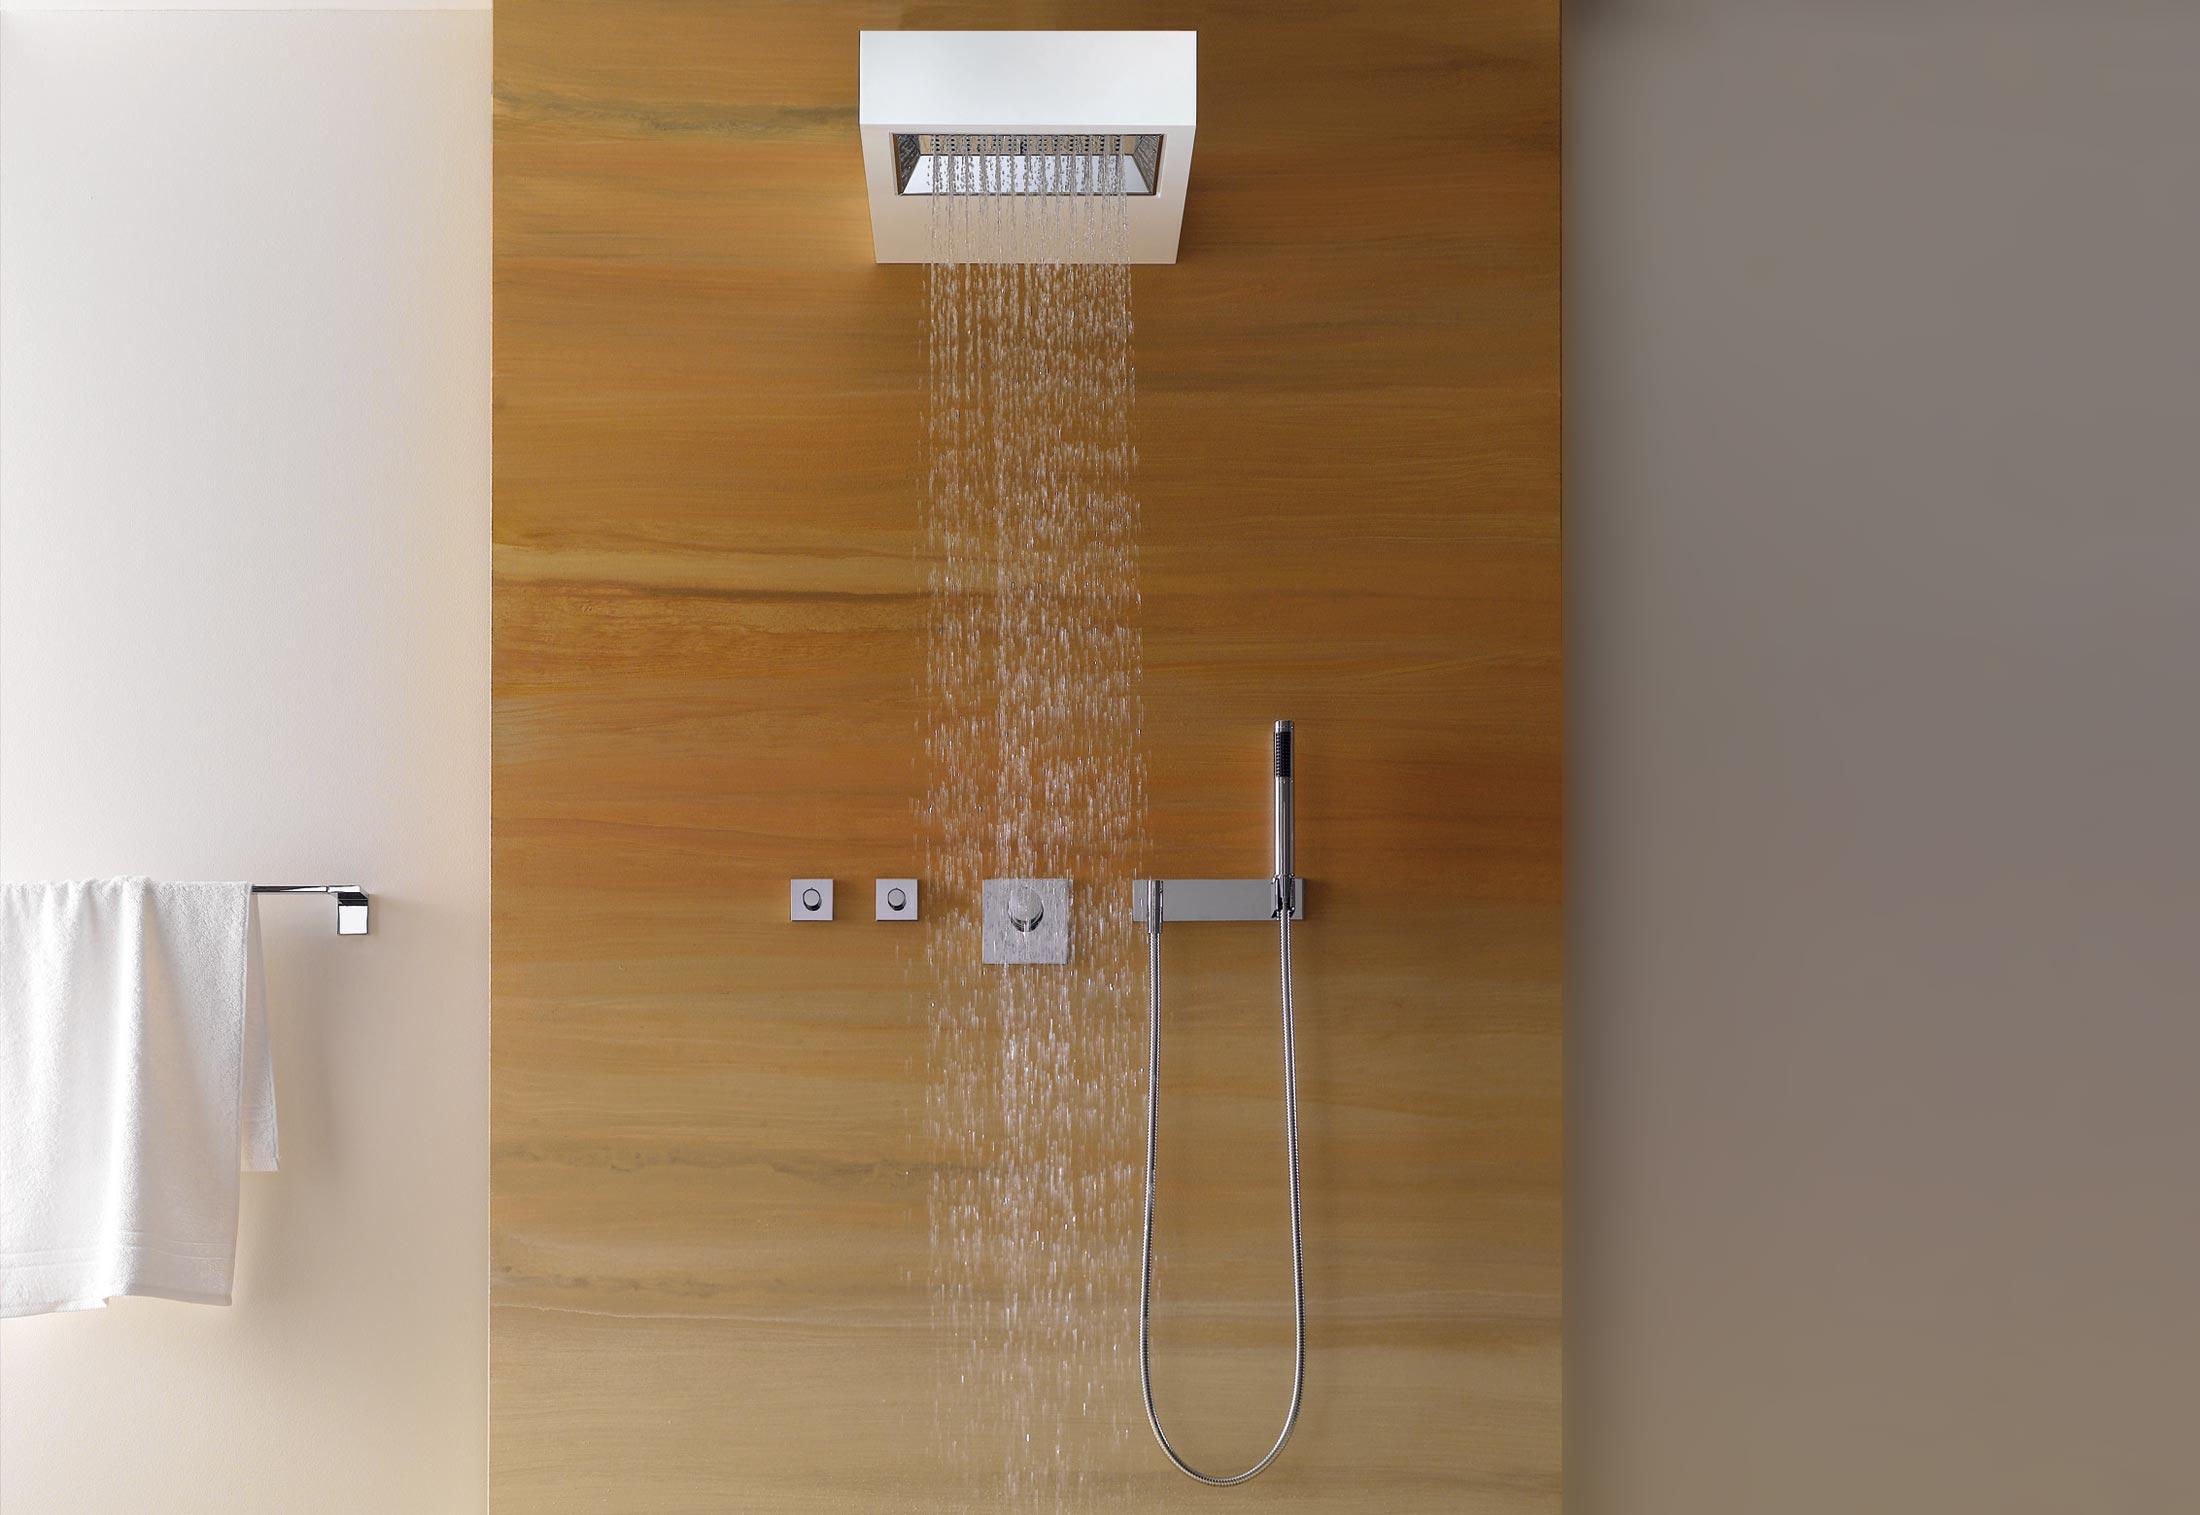 Elemental Spa SANGHA Shower with wall fixing by Dornbracht | STYLEPARK